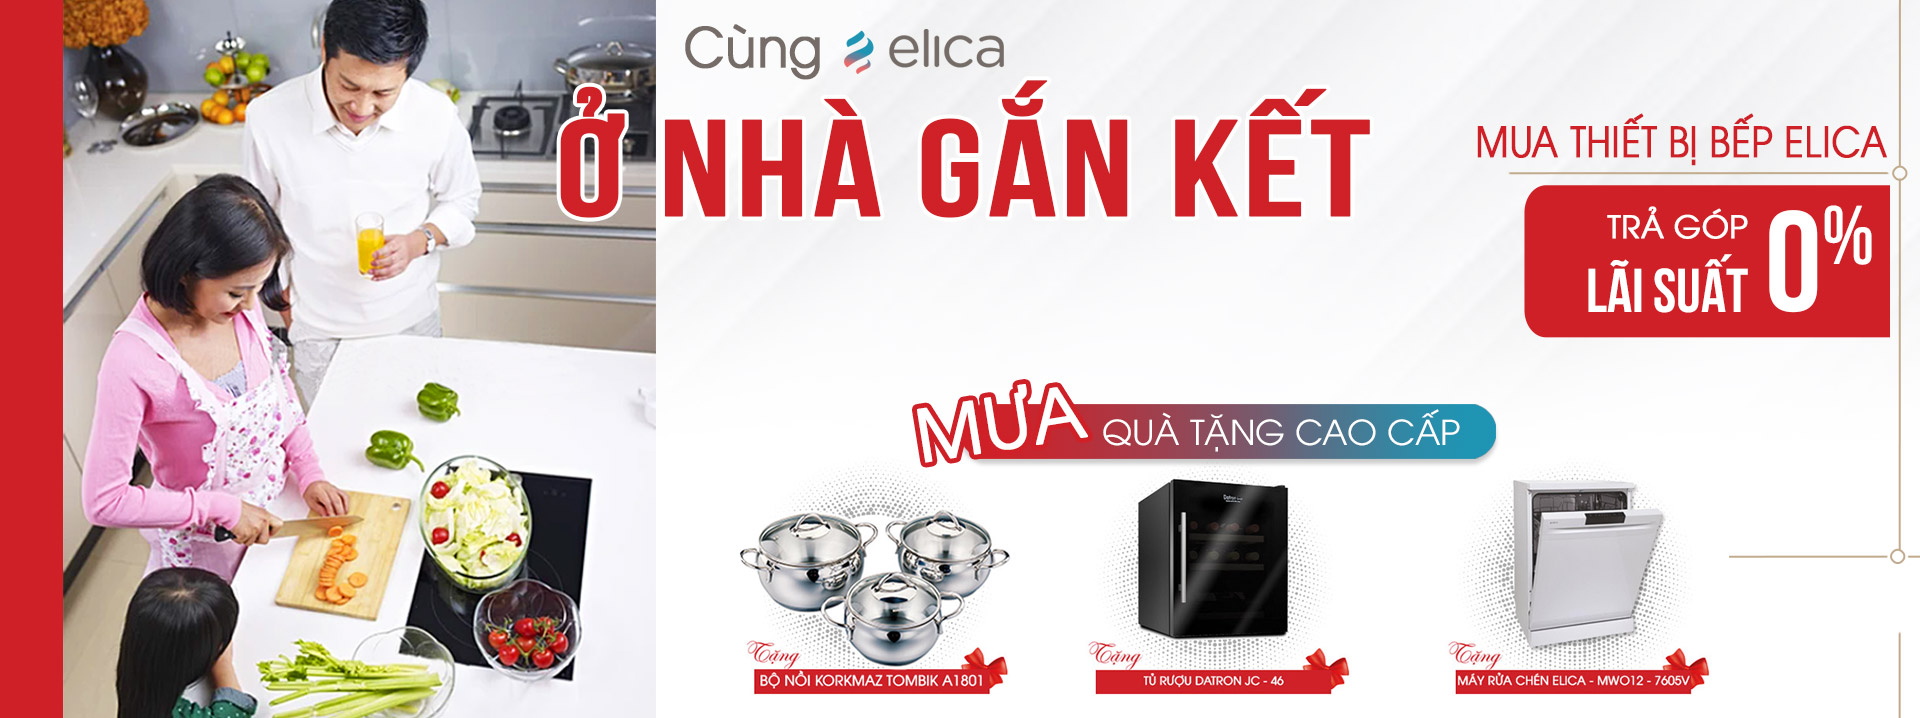 banner promotion june thiet bi bep elica